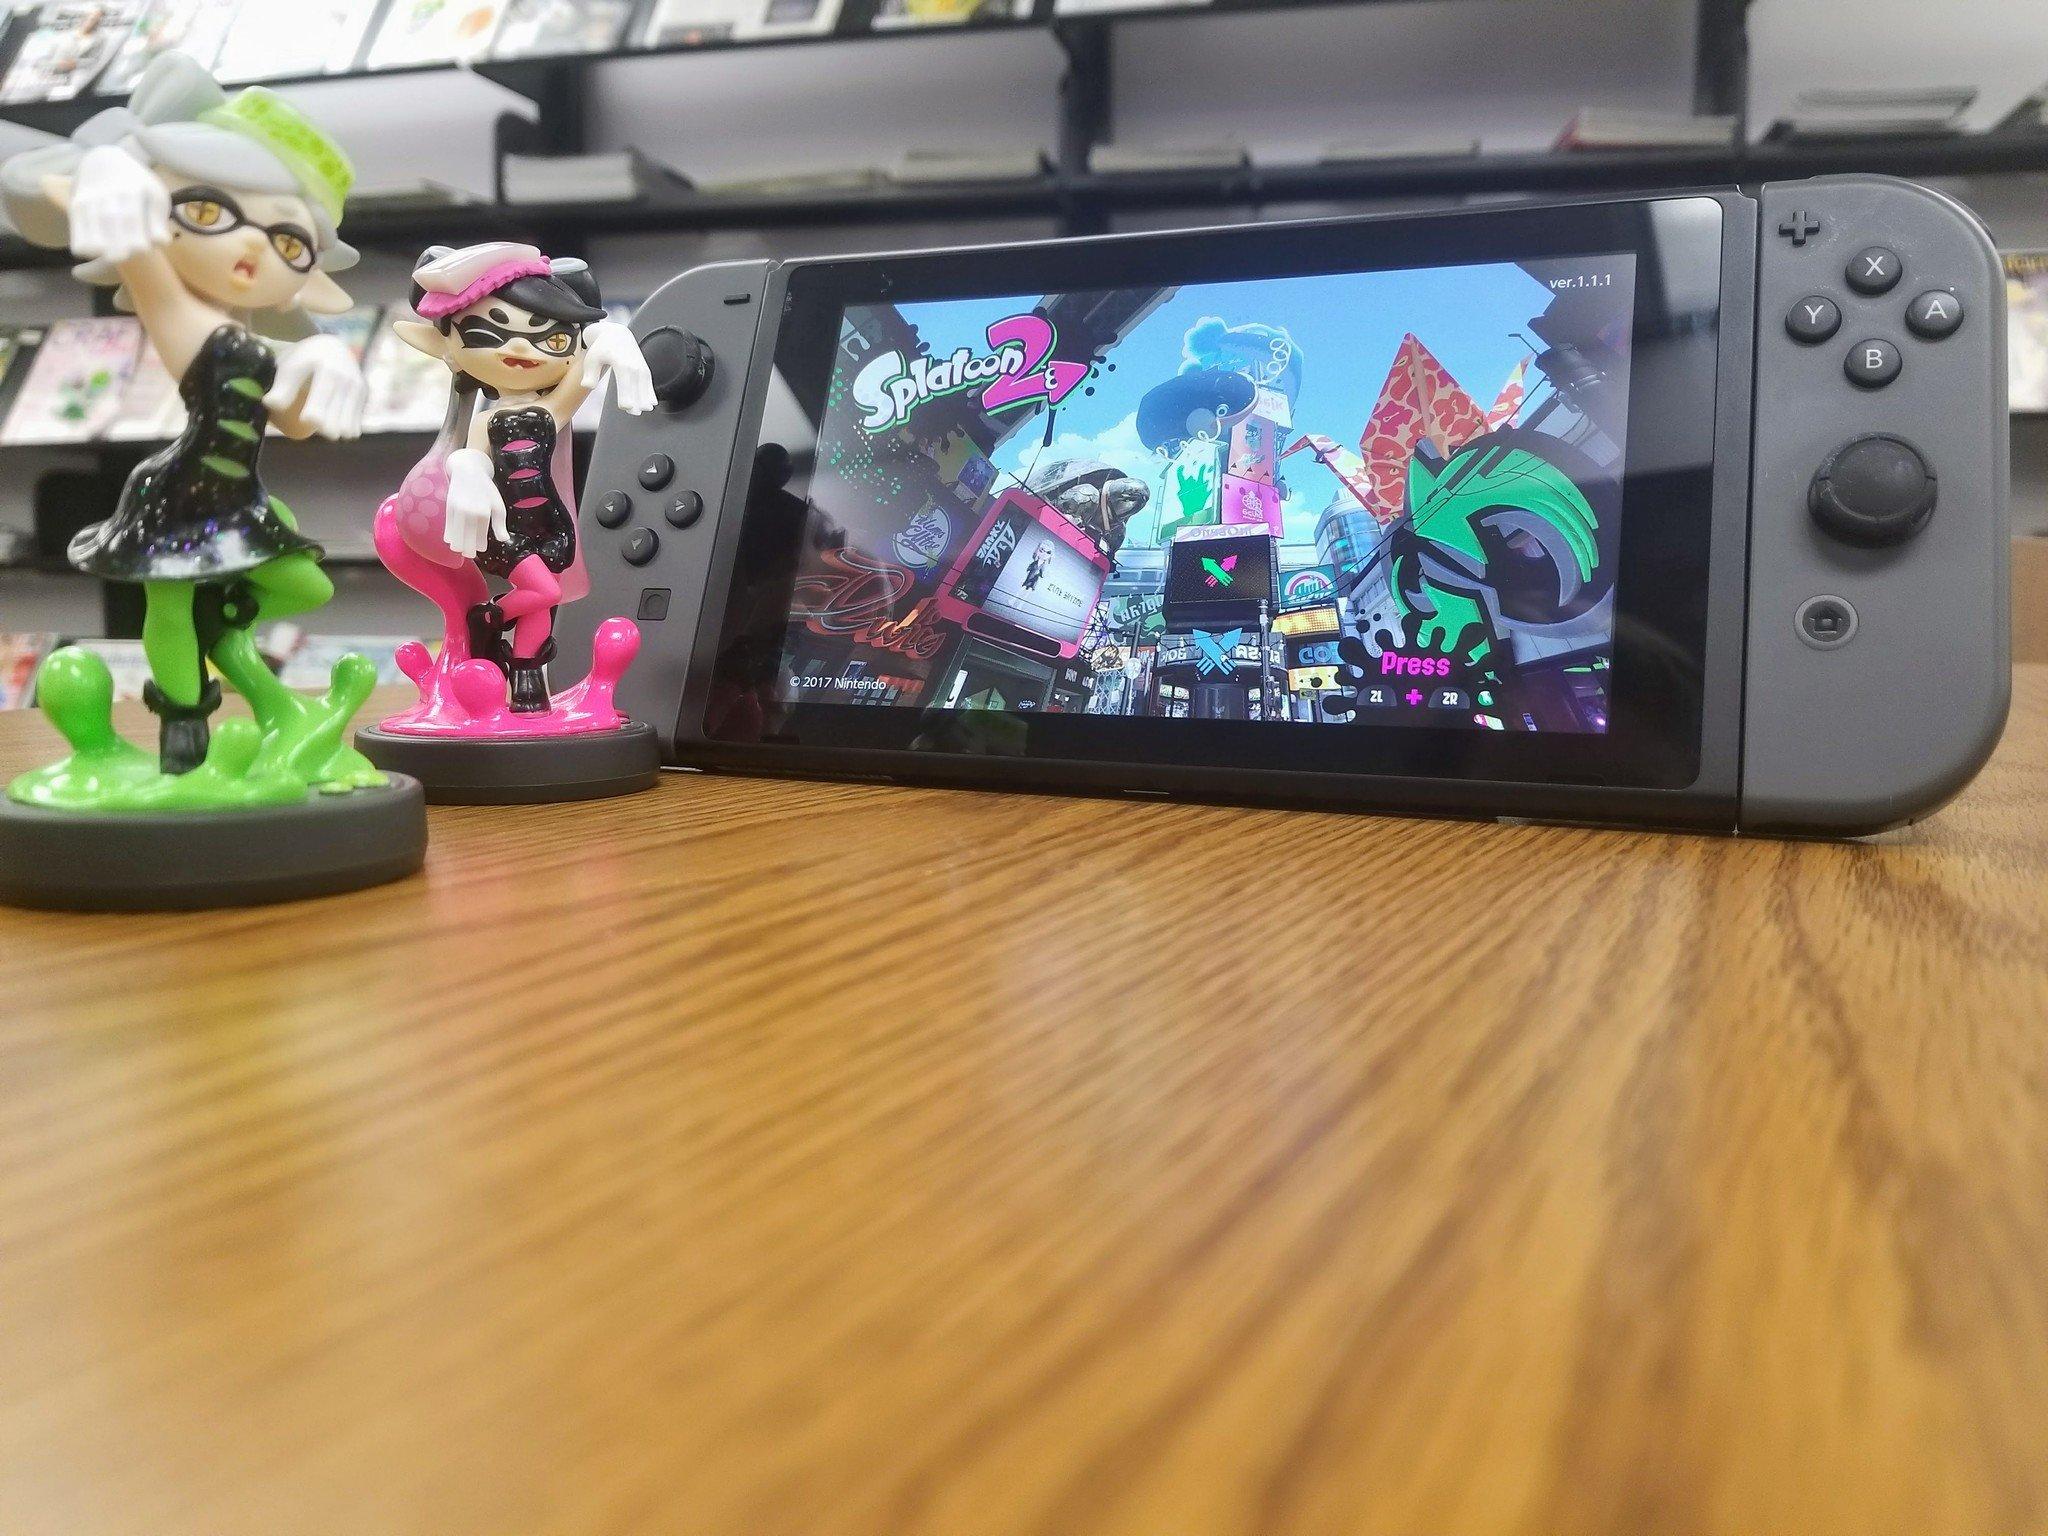 Squid Girl Iphone Wallpaper Splatoon 2 Protip Get The Callie And Marie Amiibo Imore